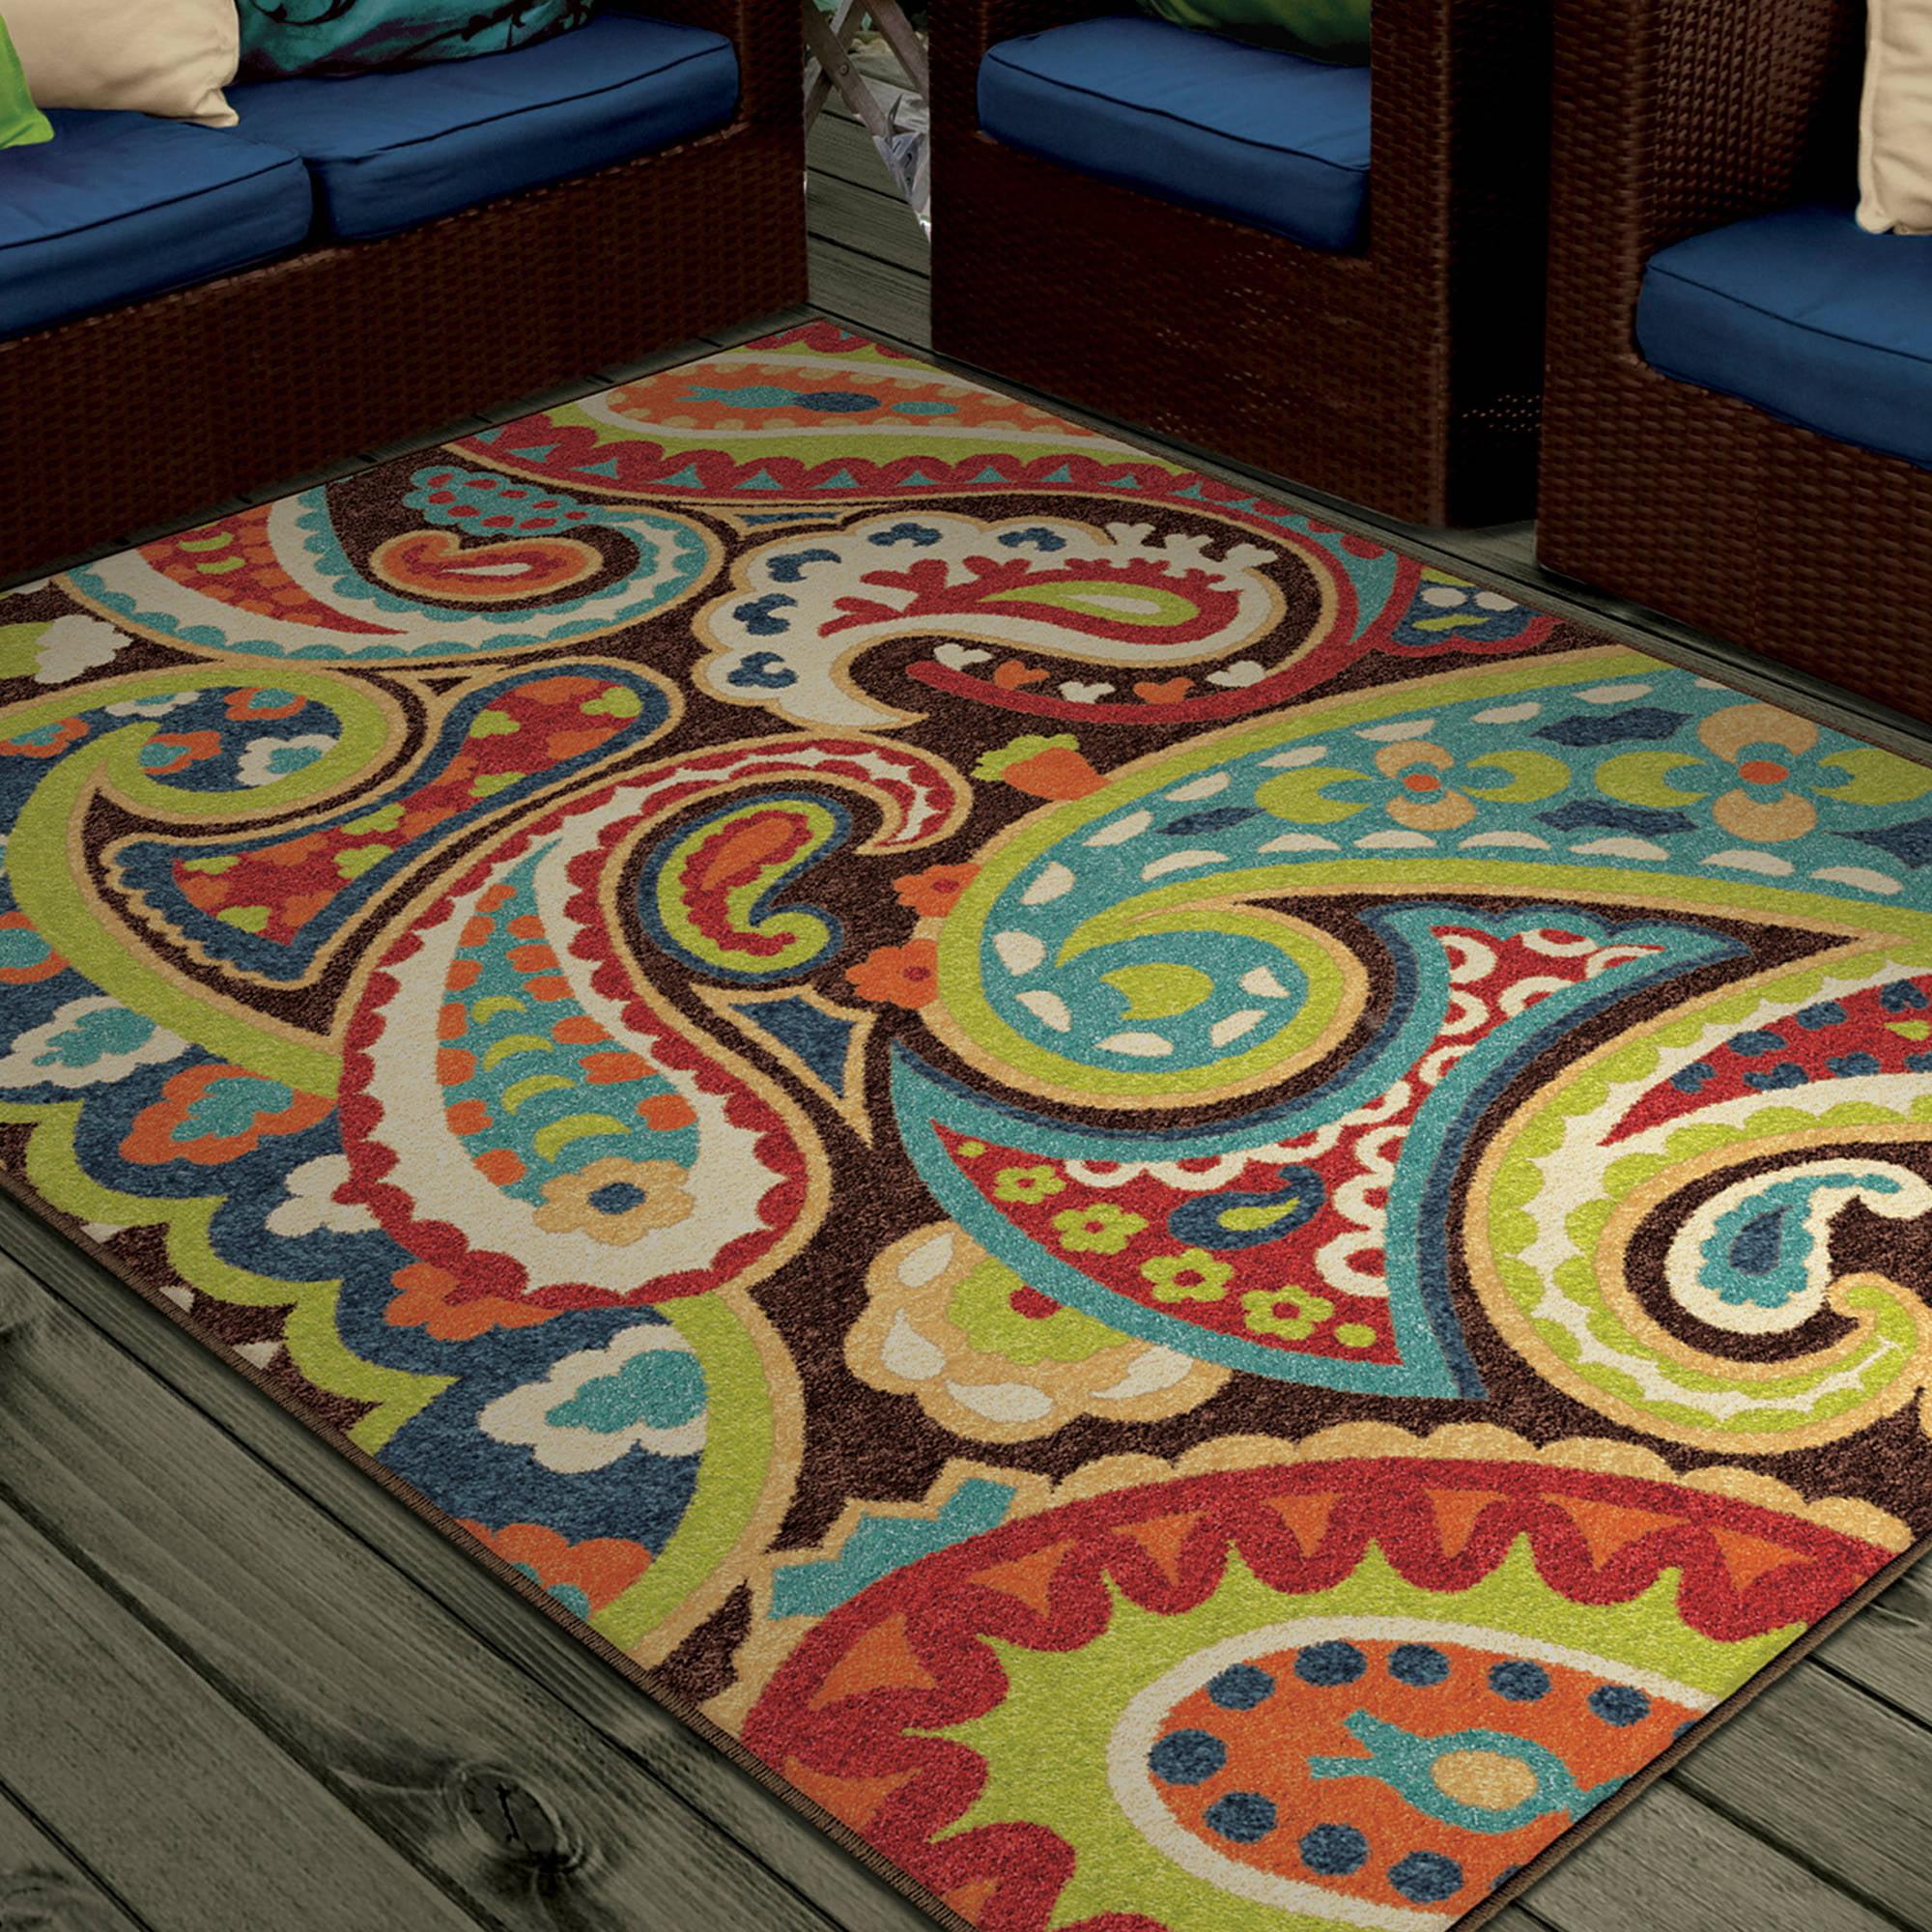 Orian Rugs Paisley Monteray Multi Colored Area Rug